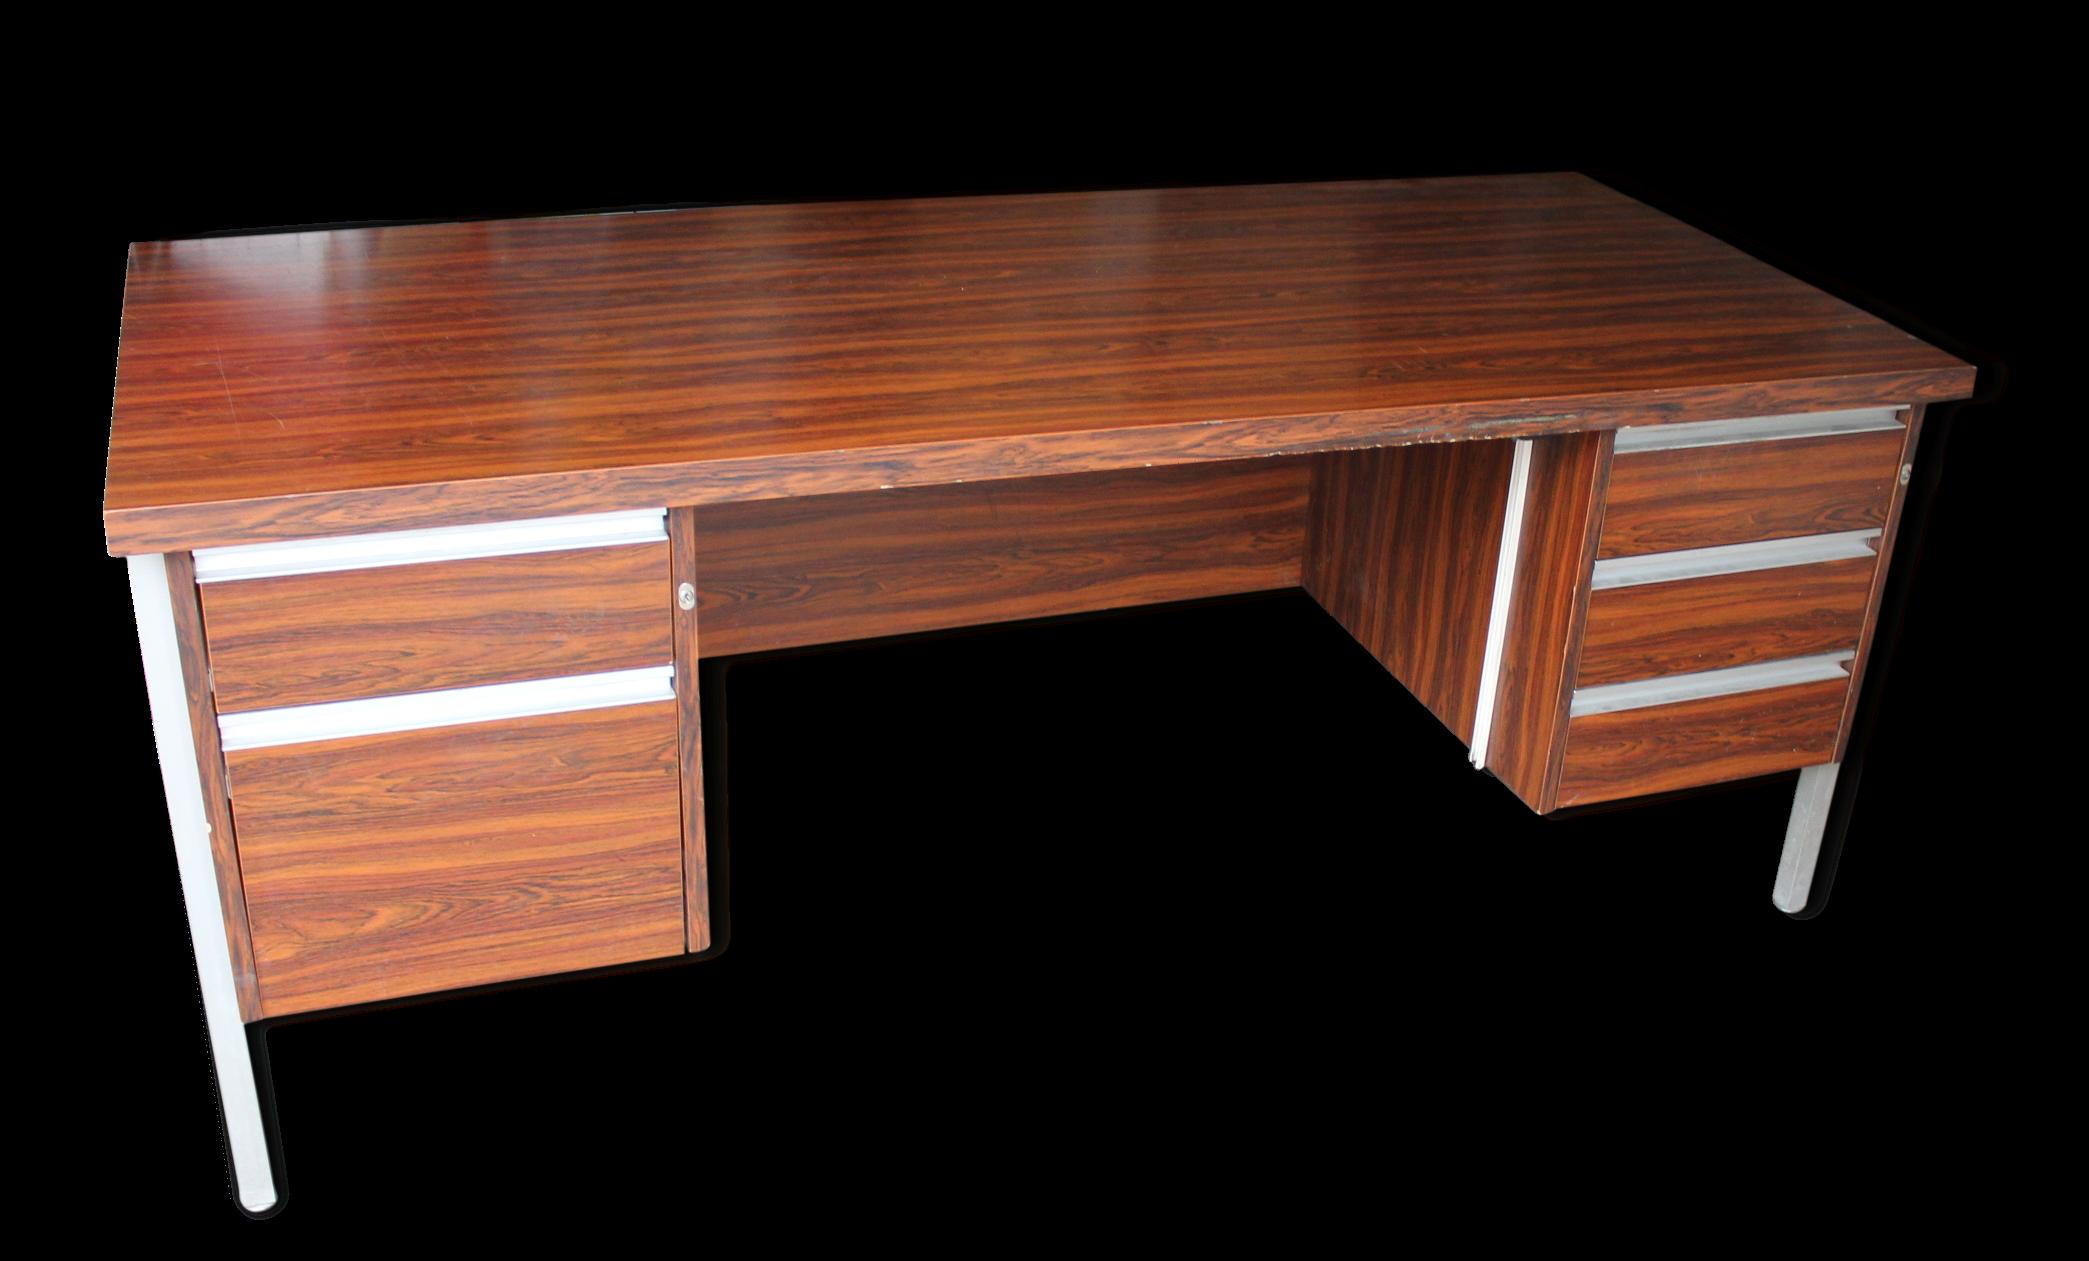 grand bureau bois with grand bureau bois fabulous ralisation duun grand bureau design avec un. Black Bedroom Furniture Sets. Home Design Ideas